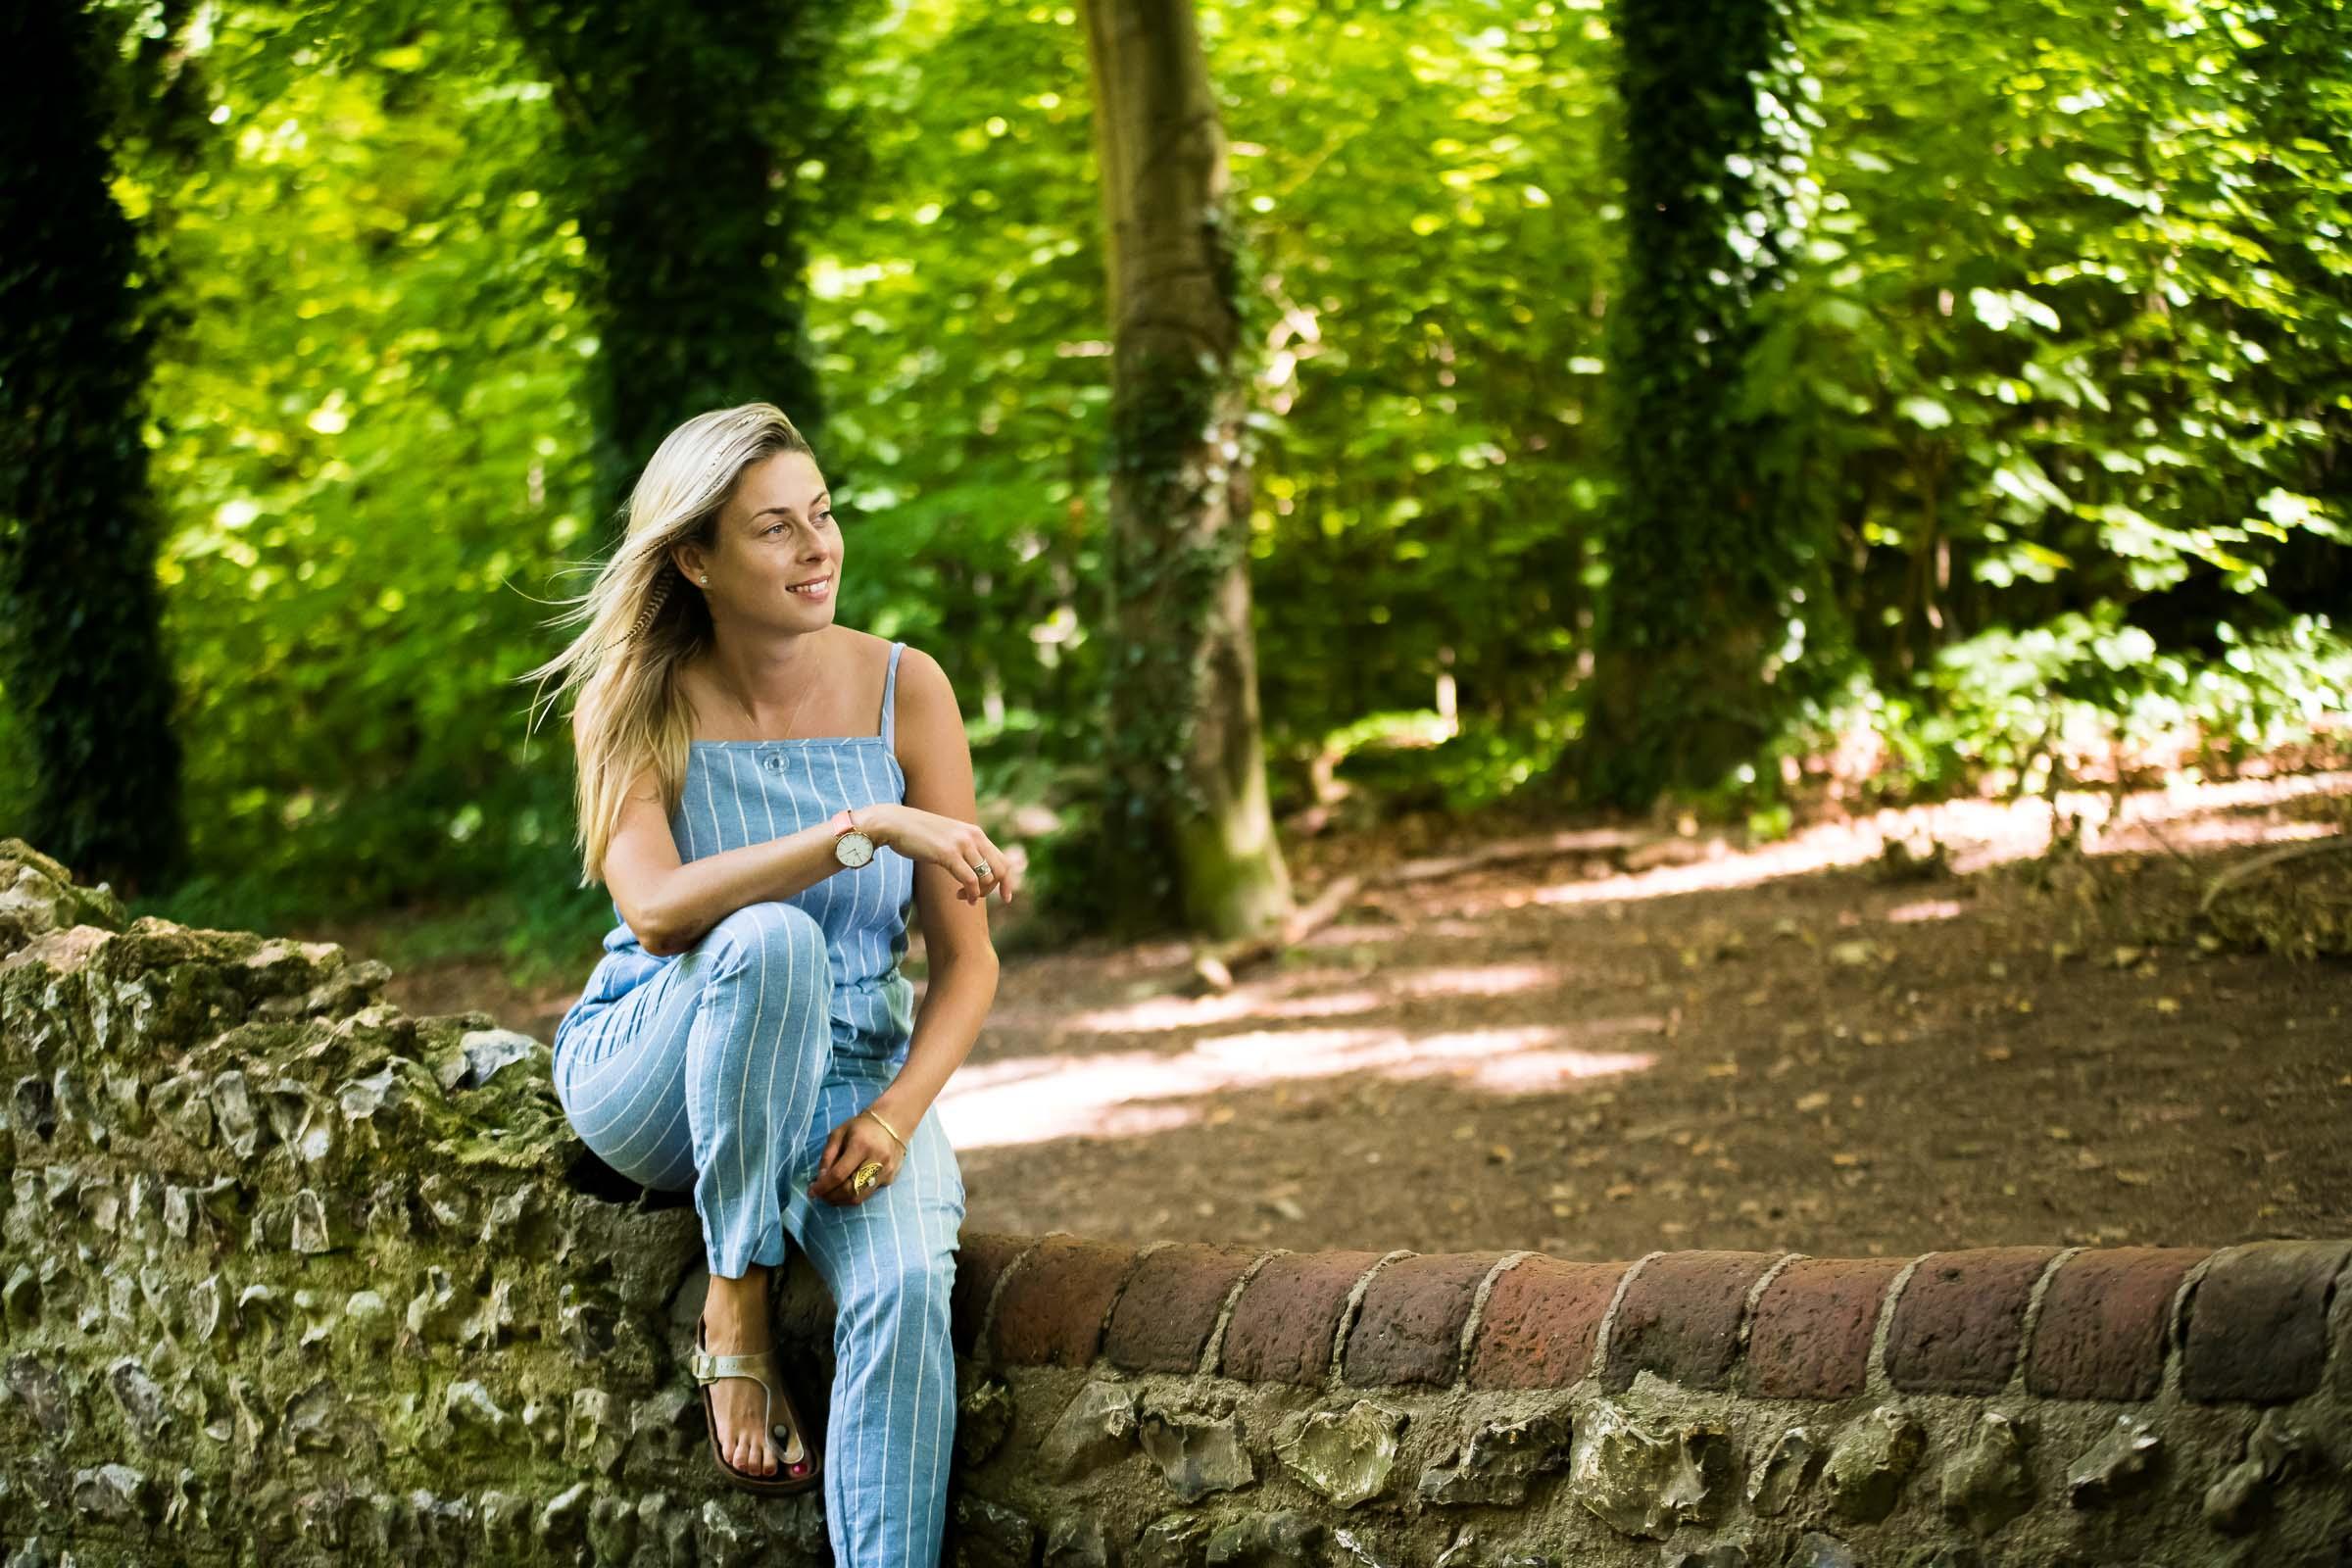 International Personal Brand Outdoor Portrait and Retreat Photographer for women - Magdalena Smolarska Photography based in UK, London & Brighton-10.jpg